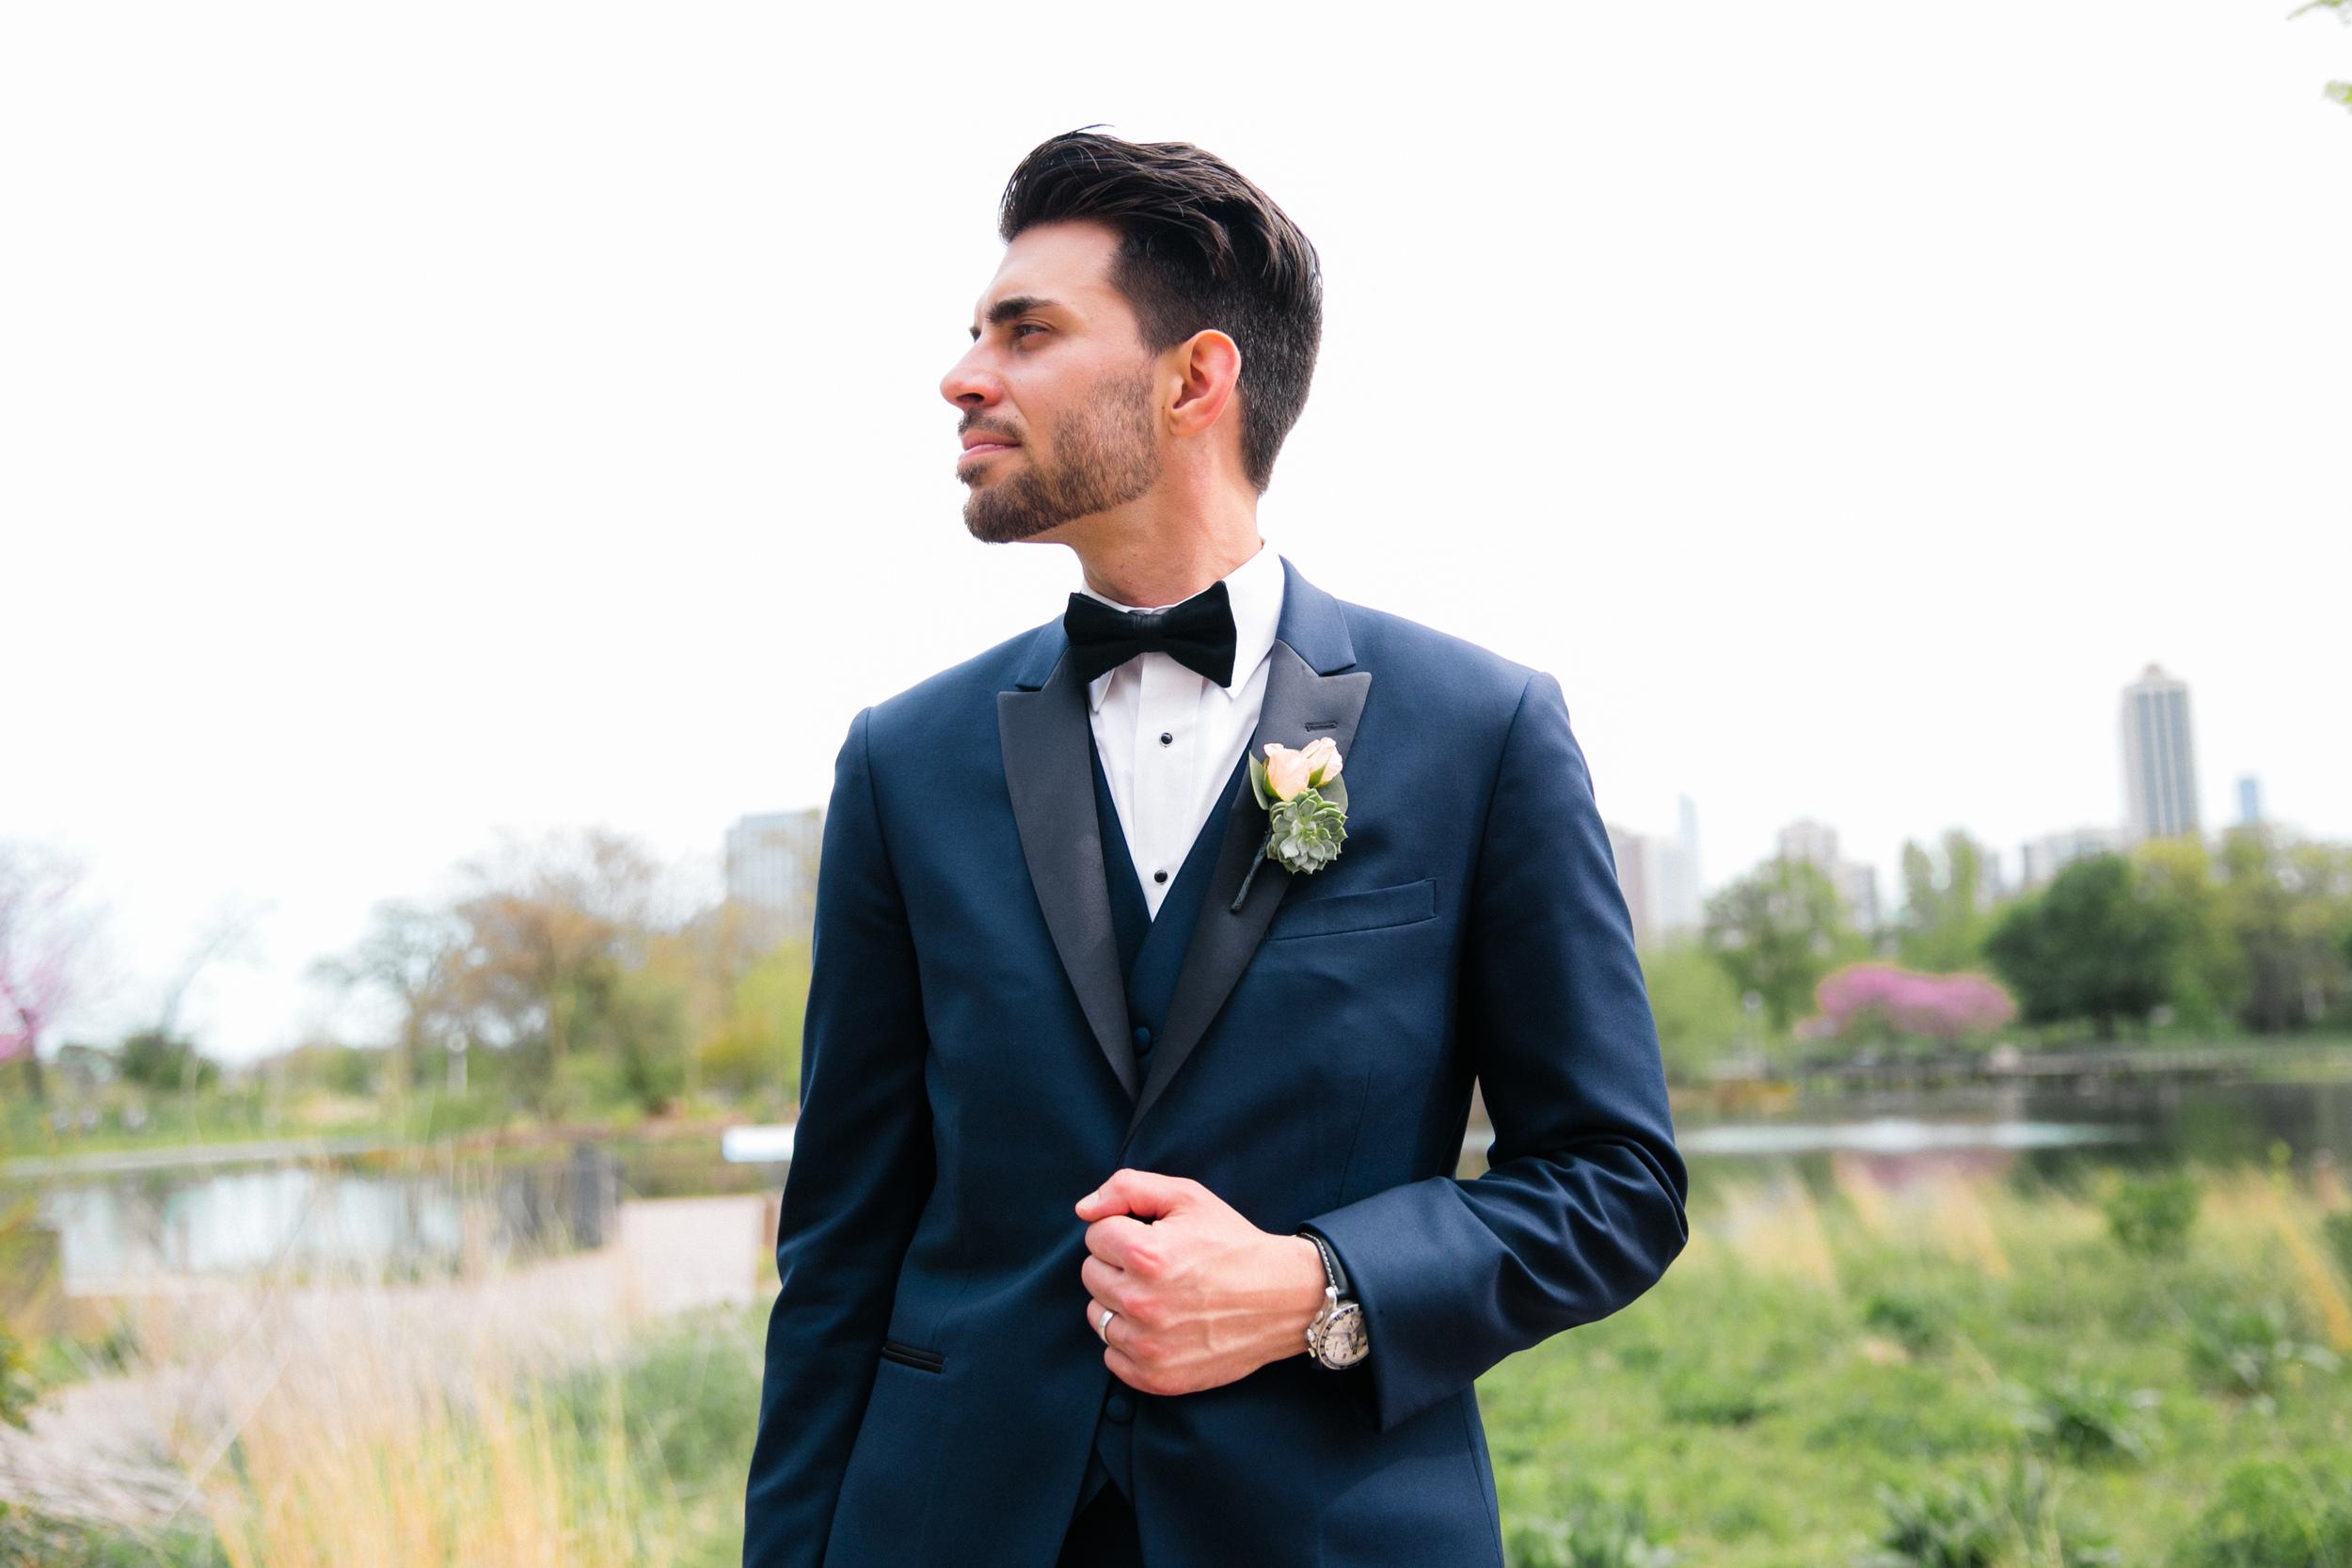 mayden_photography_weddings-82.jpg